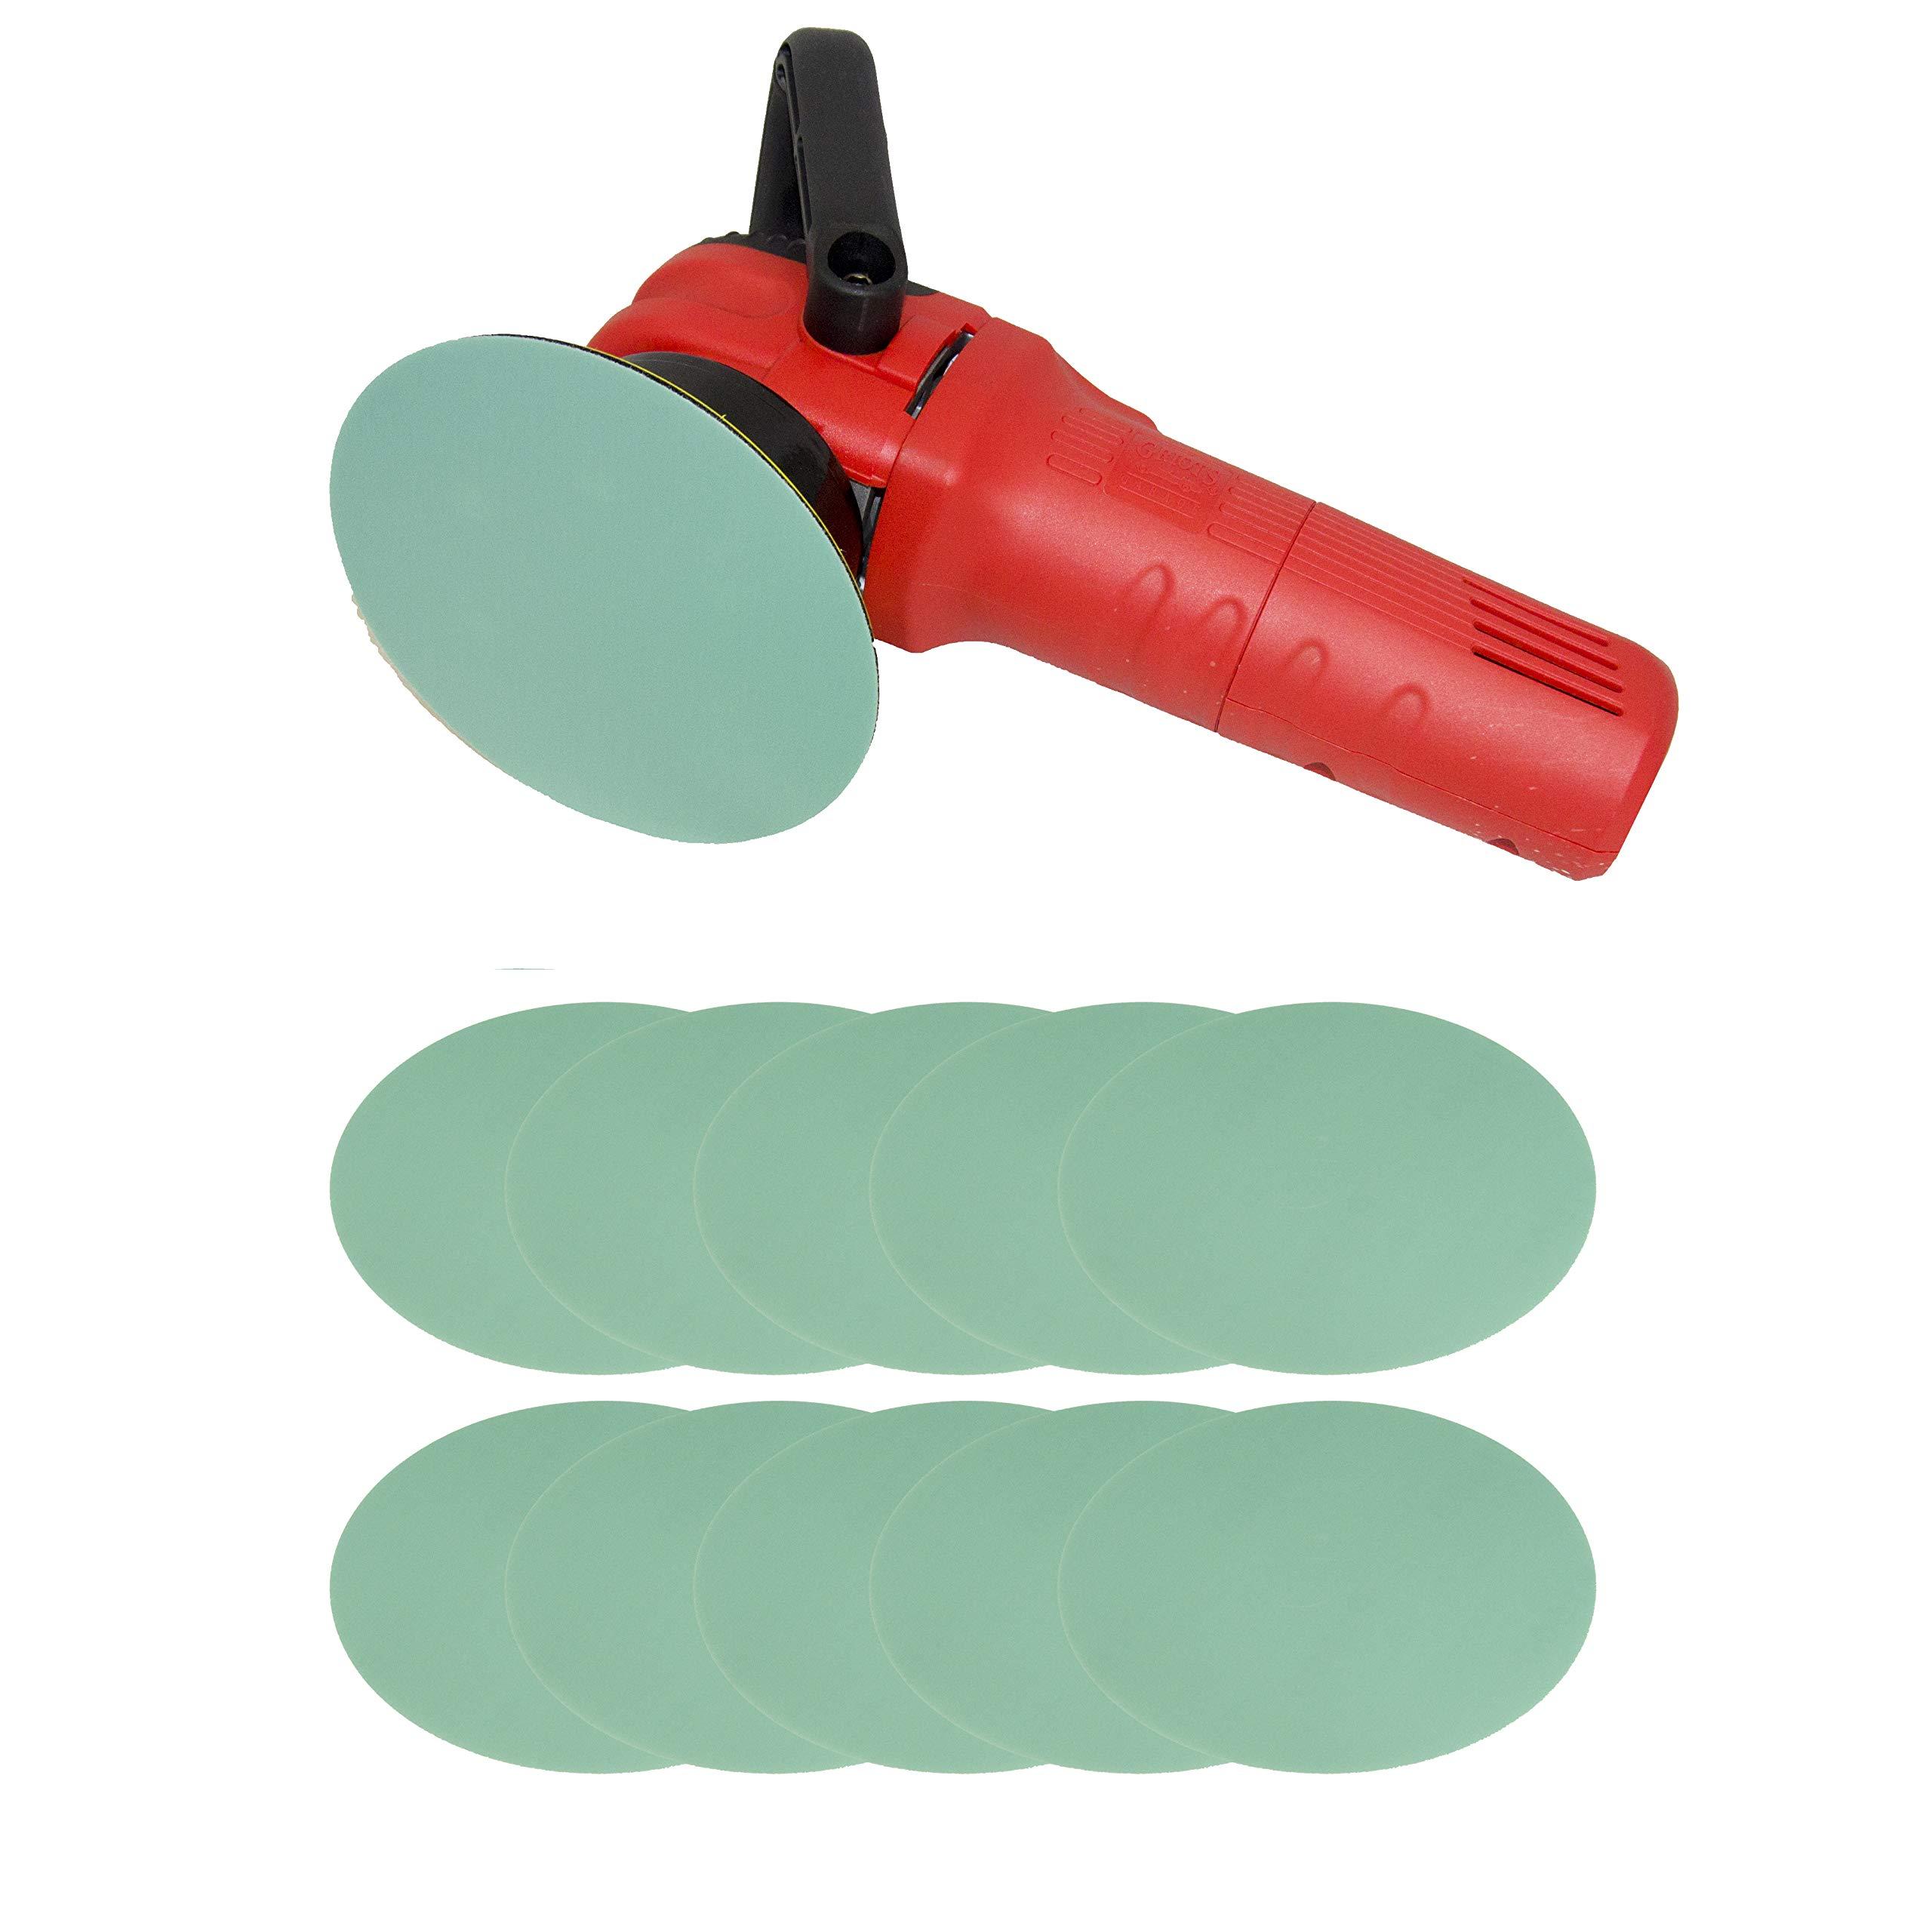 Abrasive Blending Disc 6'' 10-Pack | Sanding Pad for Automotive Paint Clear | DA Polisher Hook and Loop Backing (1000 Grit)